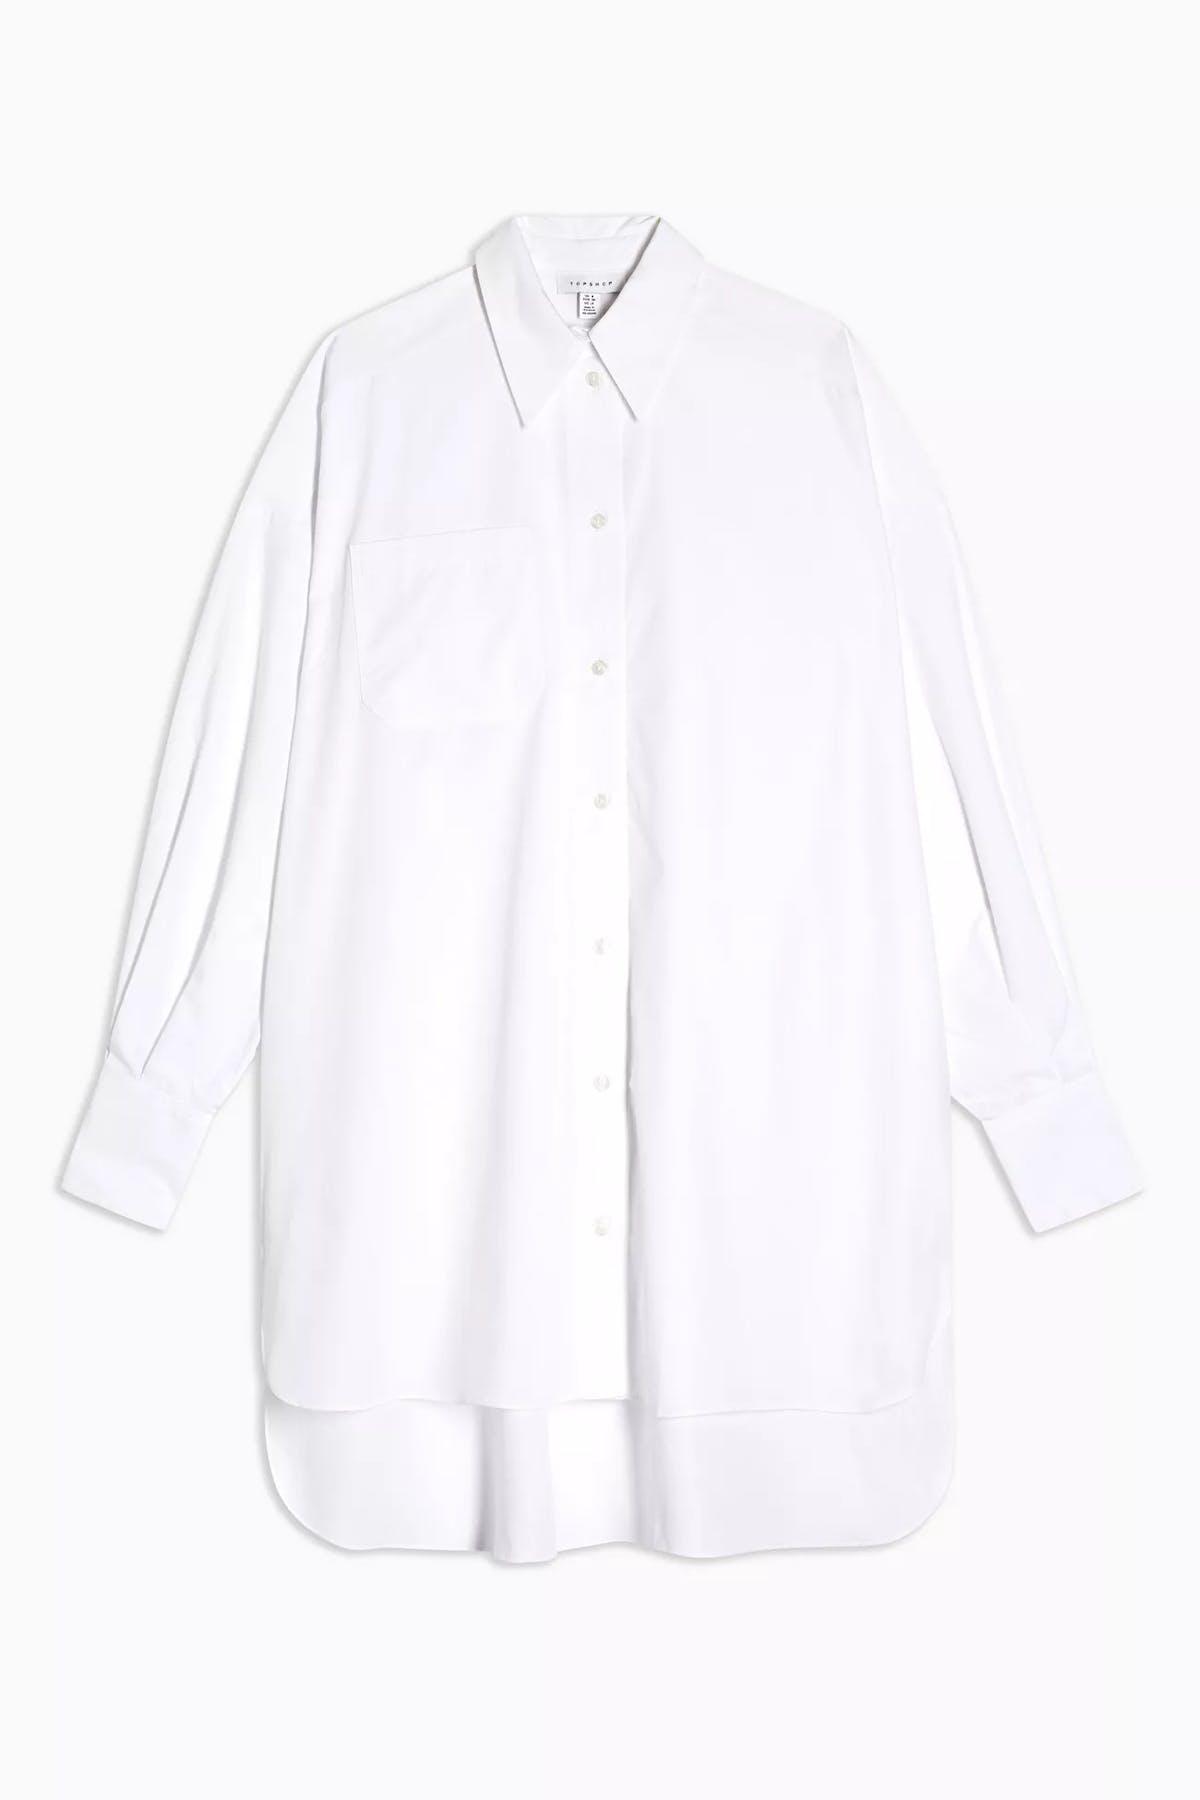 The best women's white shirts